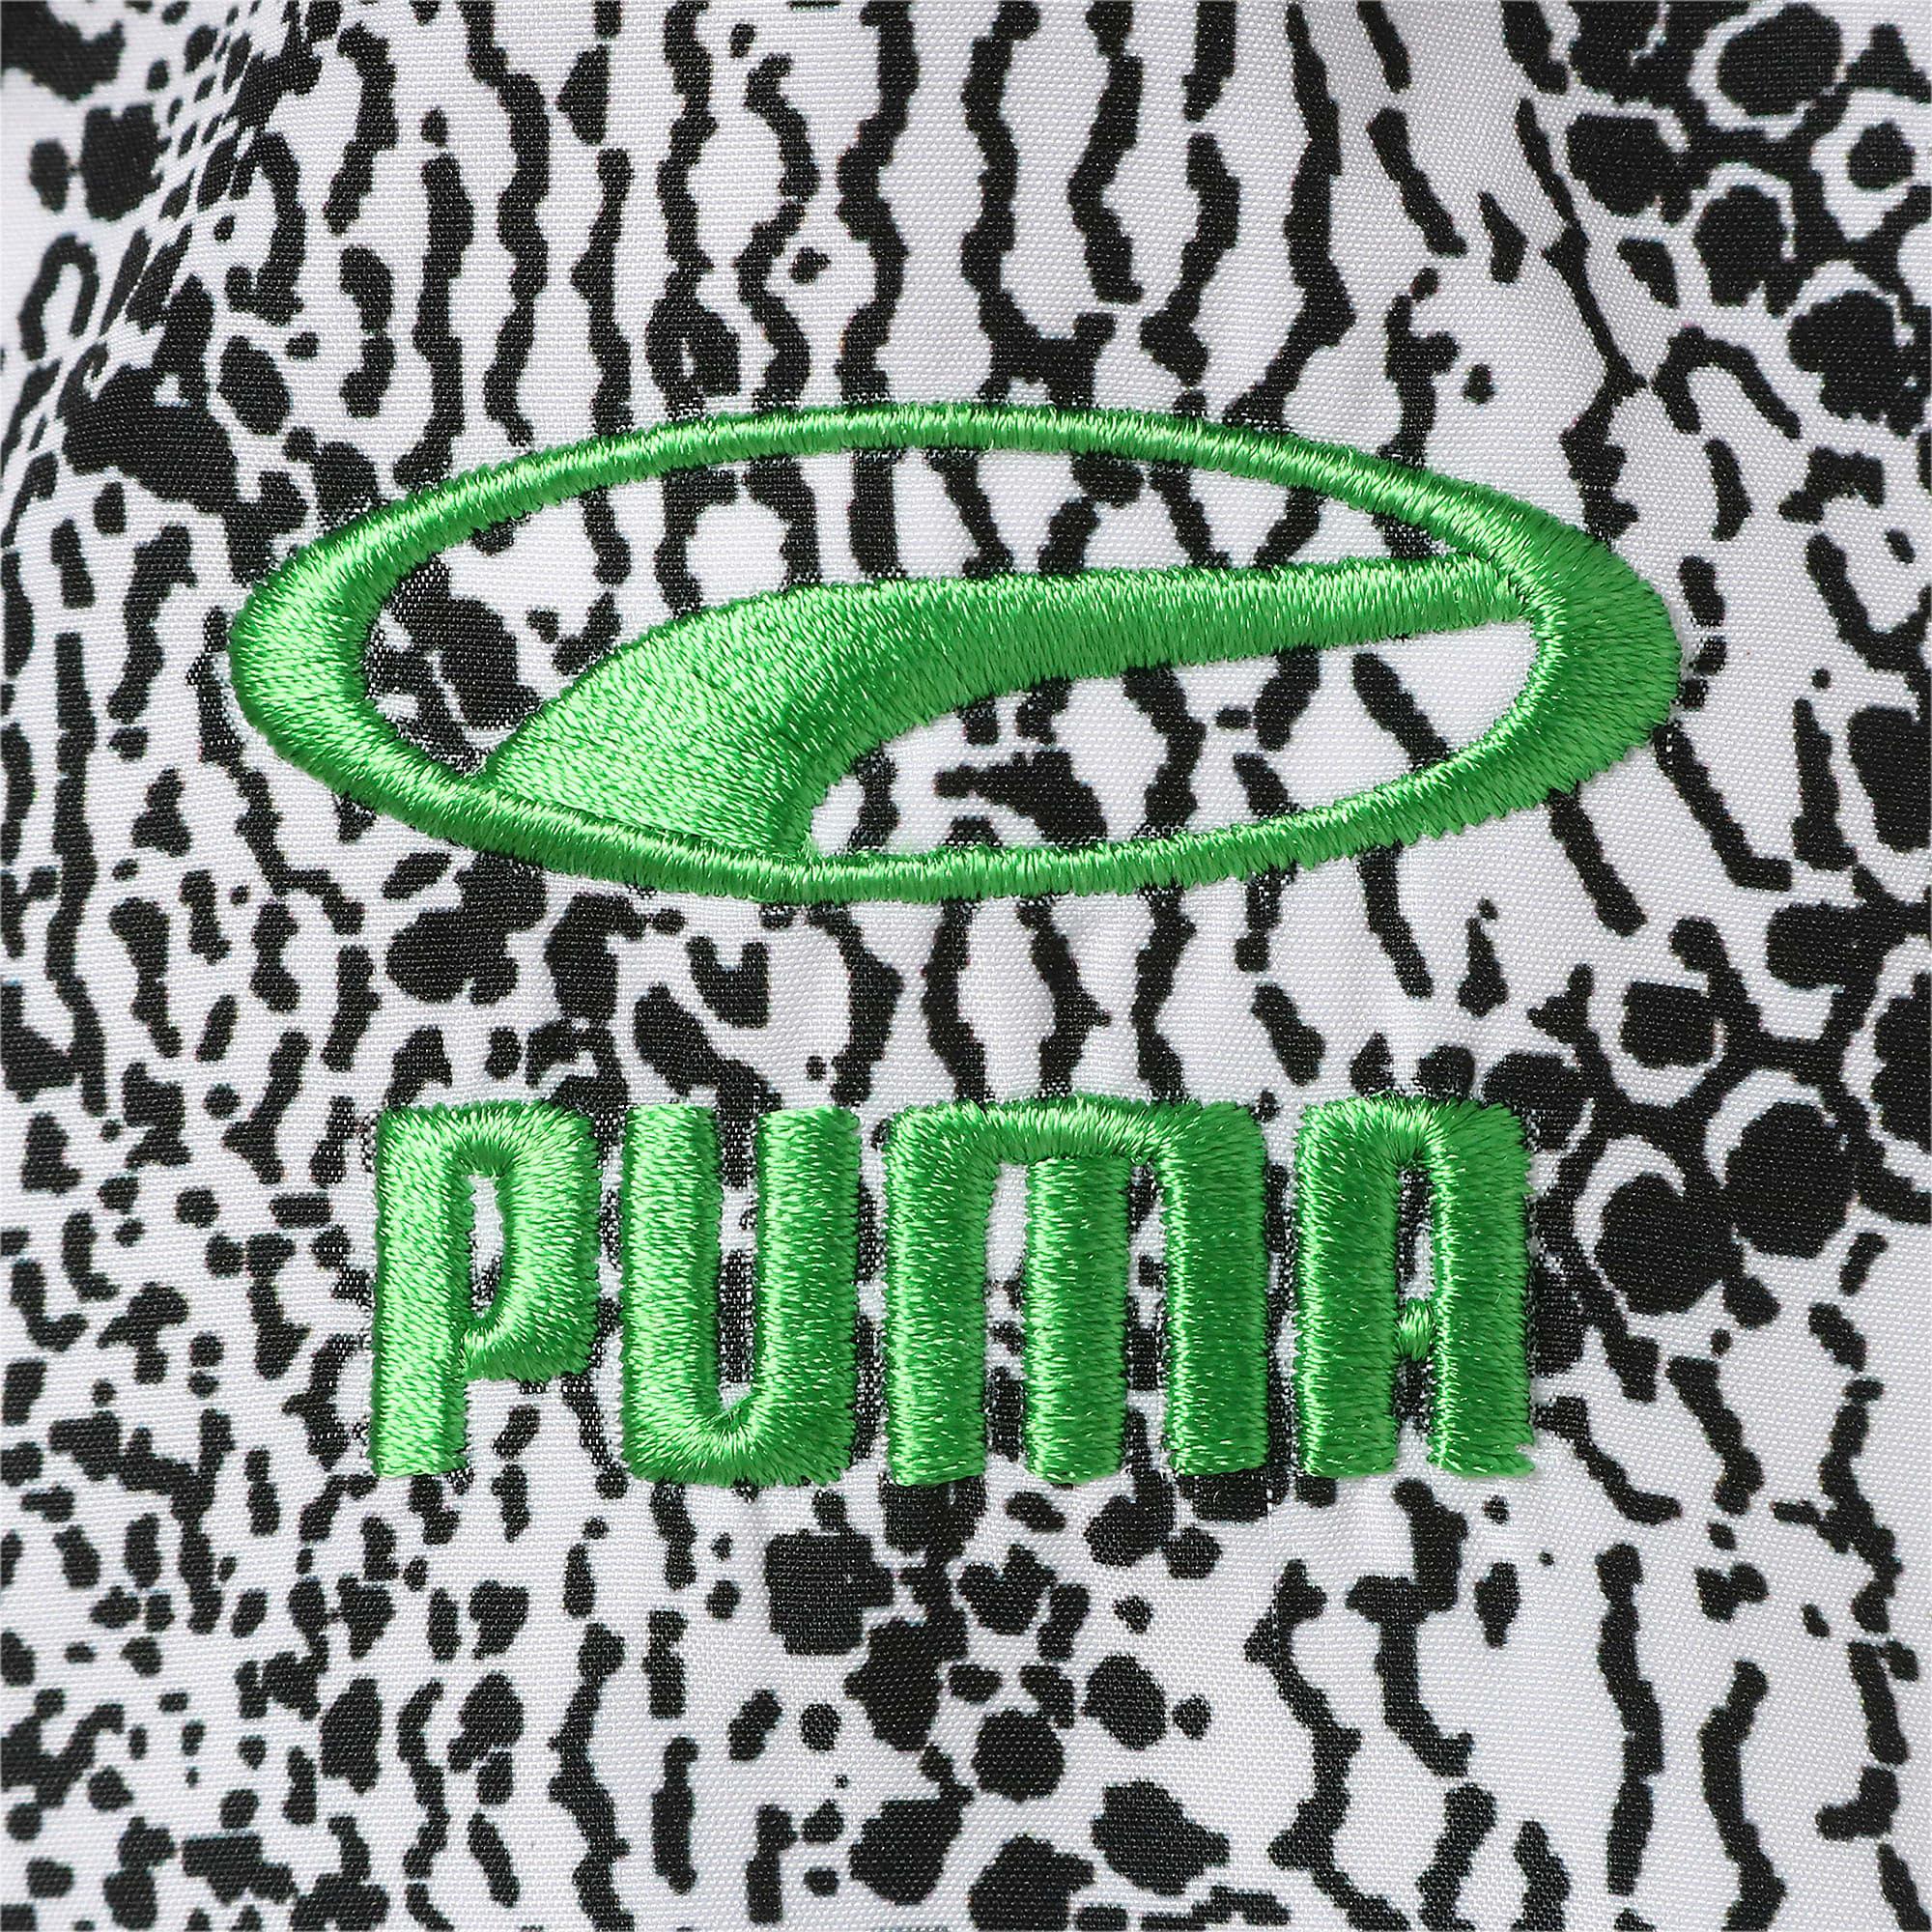 Thumbnail 8 of SNAKE PACK LUXTG ウーブン ジャケット, Puma White-AOP, medium-JPN